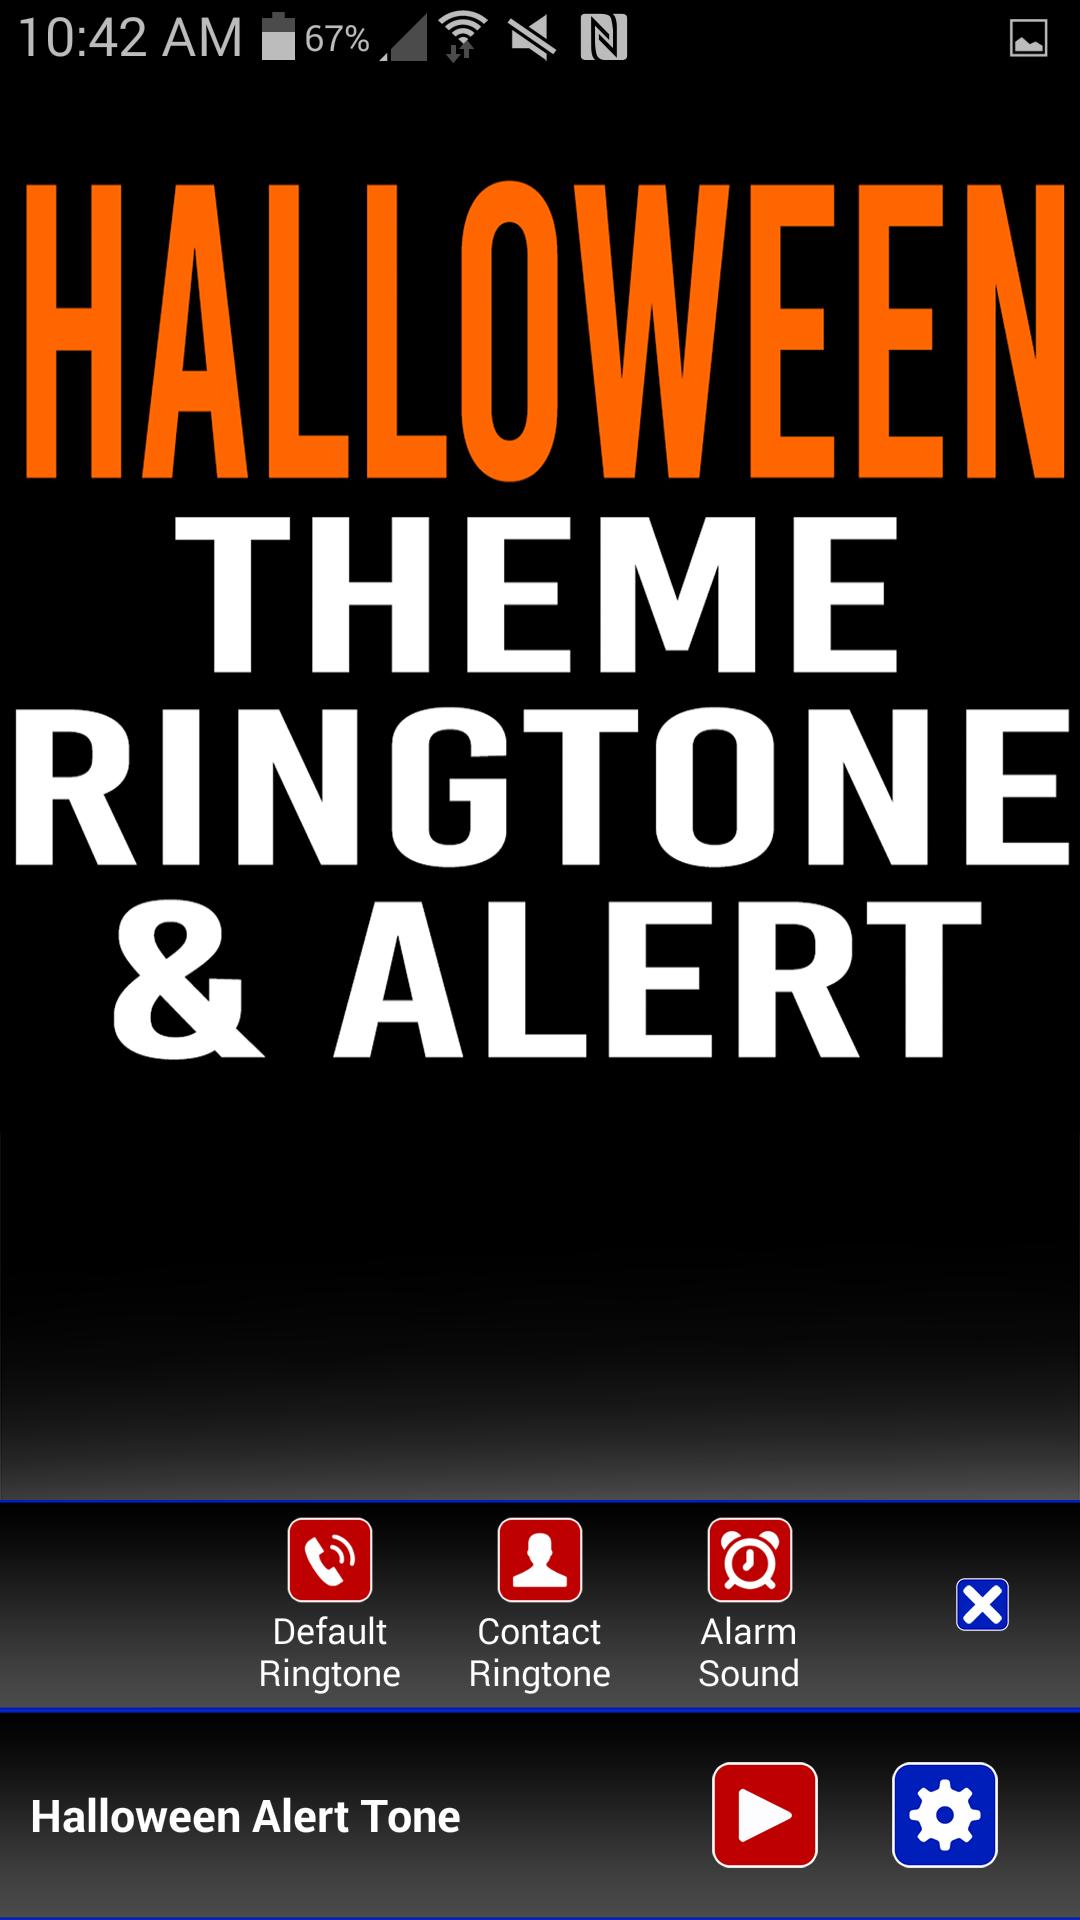 amazoncom halloween movie theme ringtone appstore for android